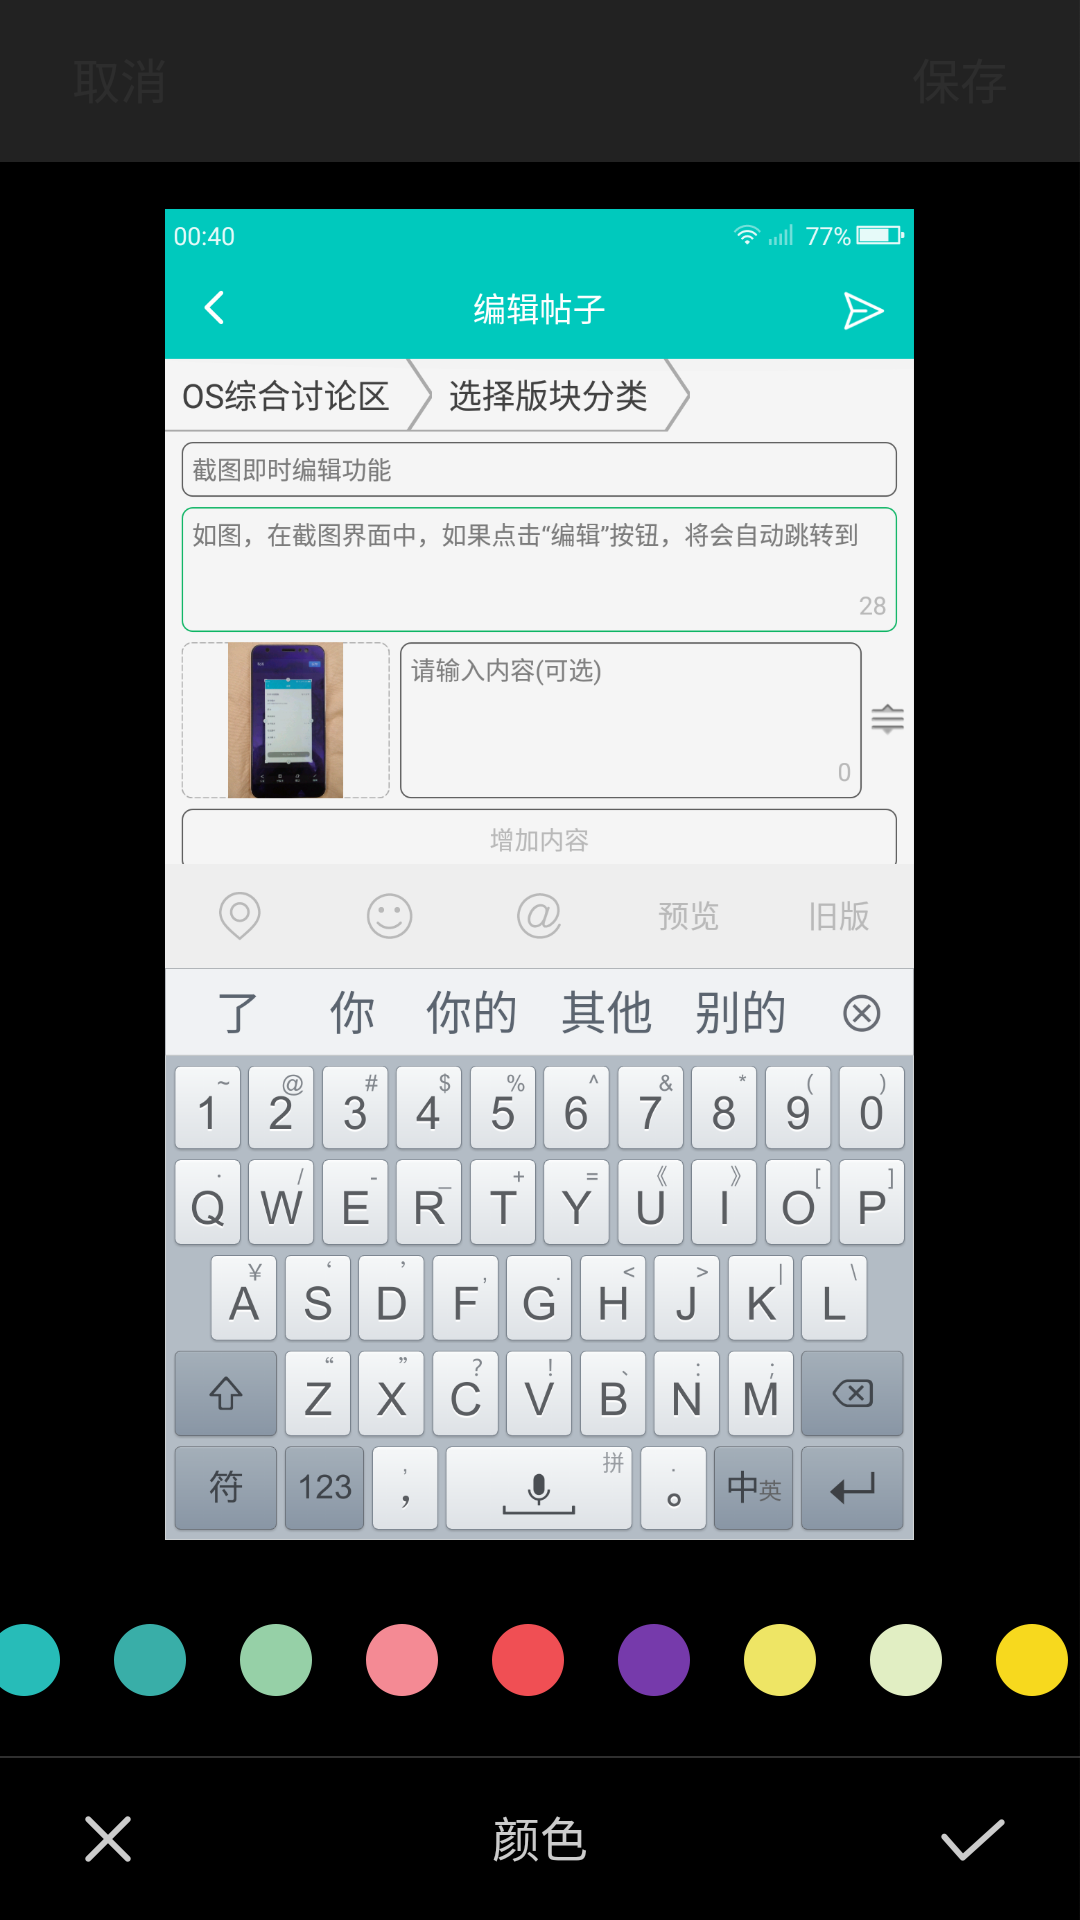 Screenshot_2018-02-25-00-40-51.png